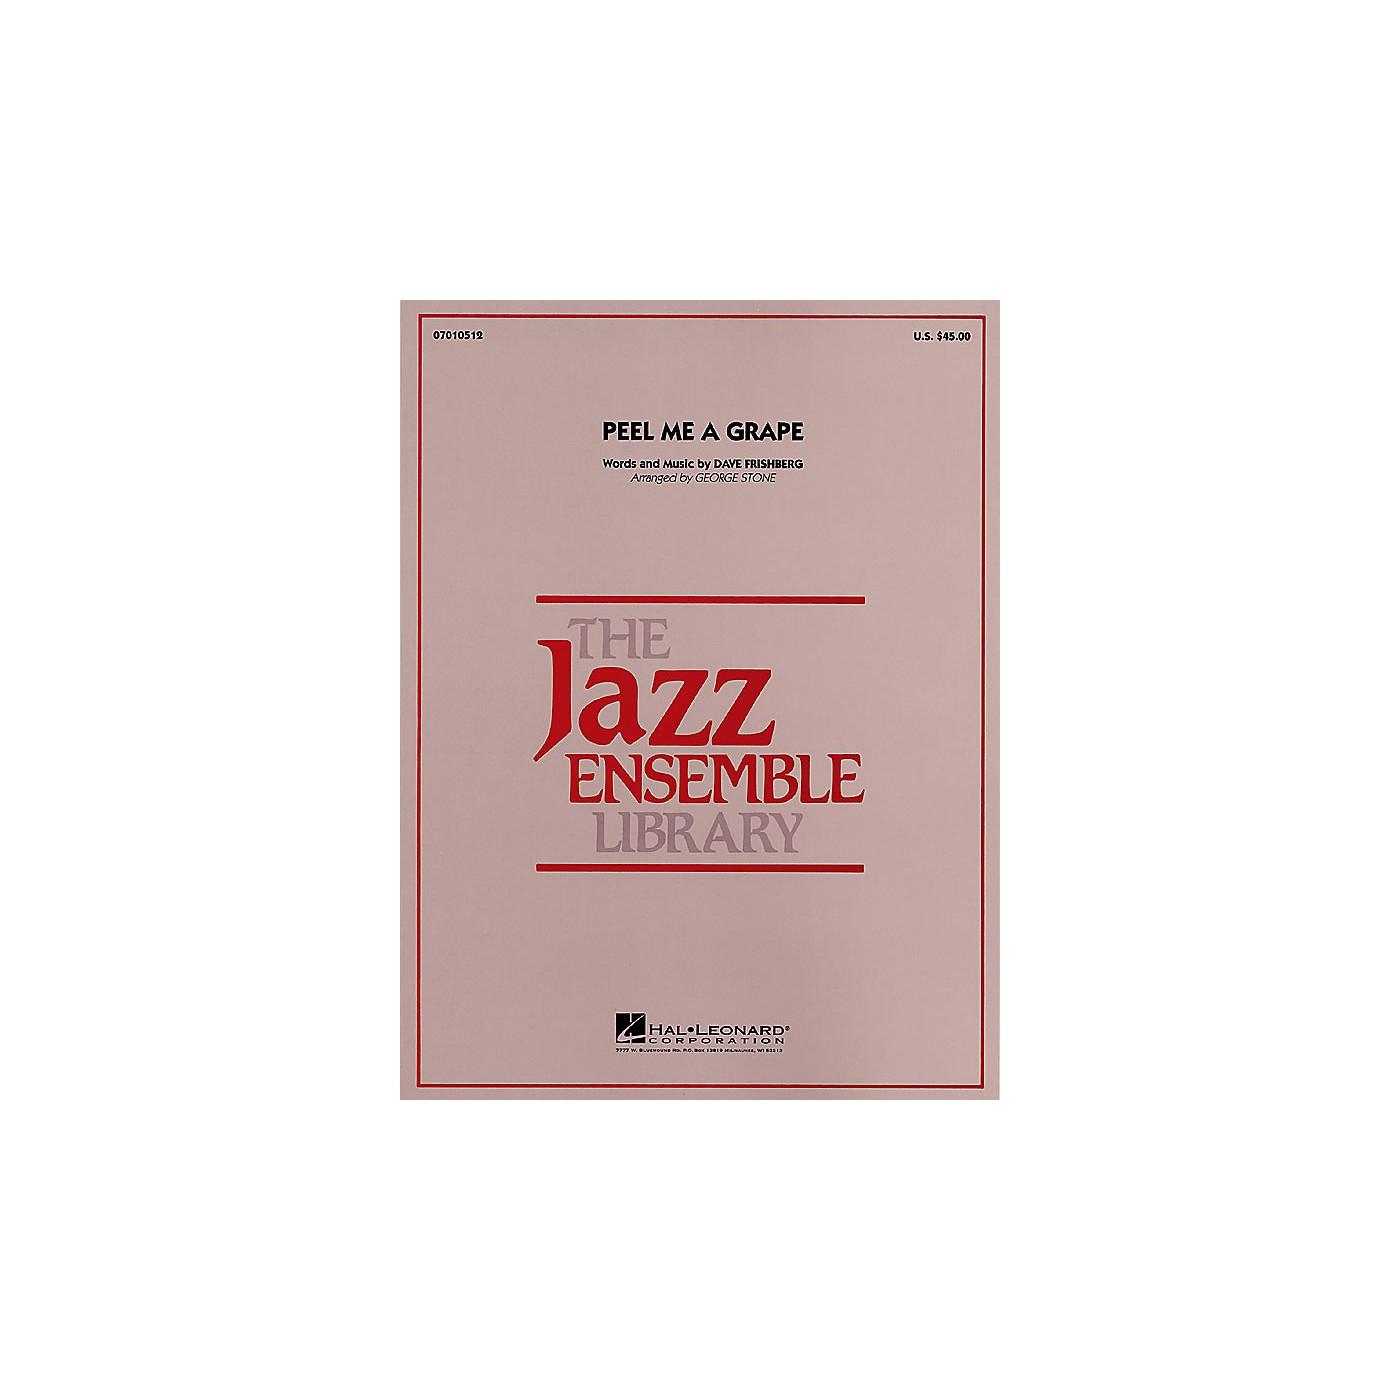 Hal Leonard Peel Me a Grape Jazz Band Level 4 Arranged by George Stone thumbnail